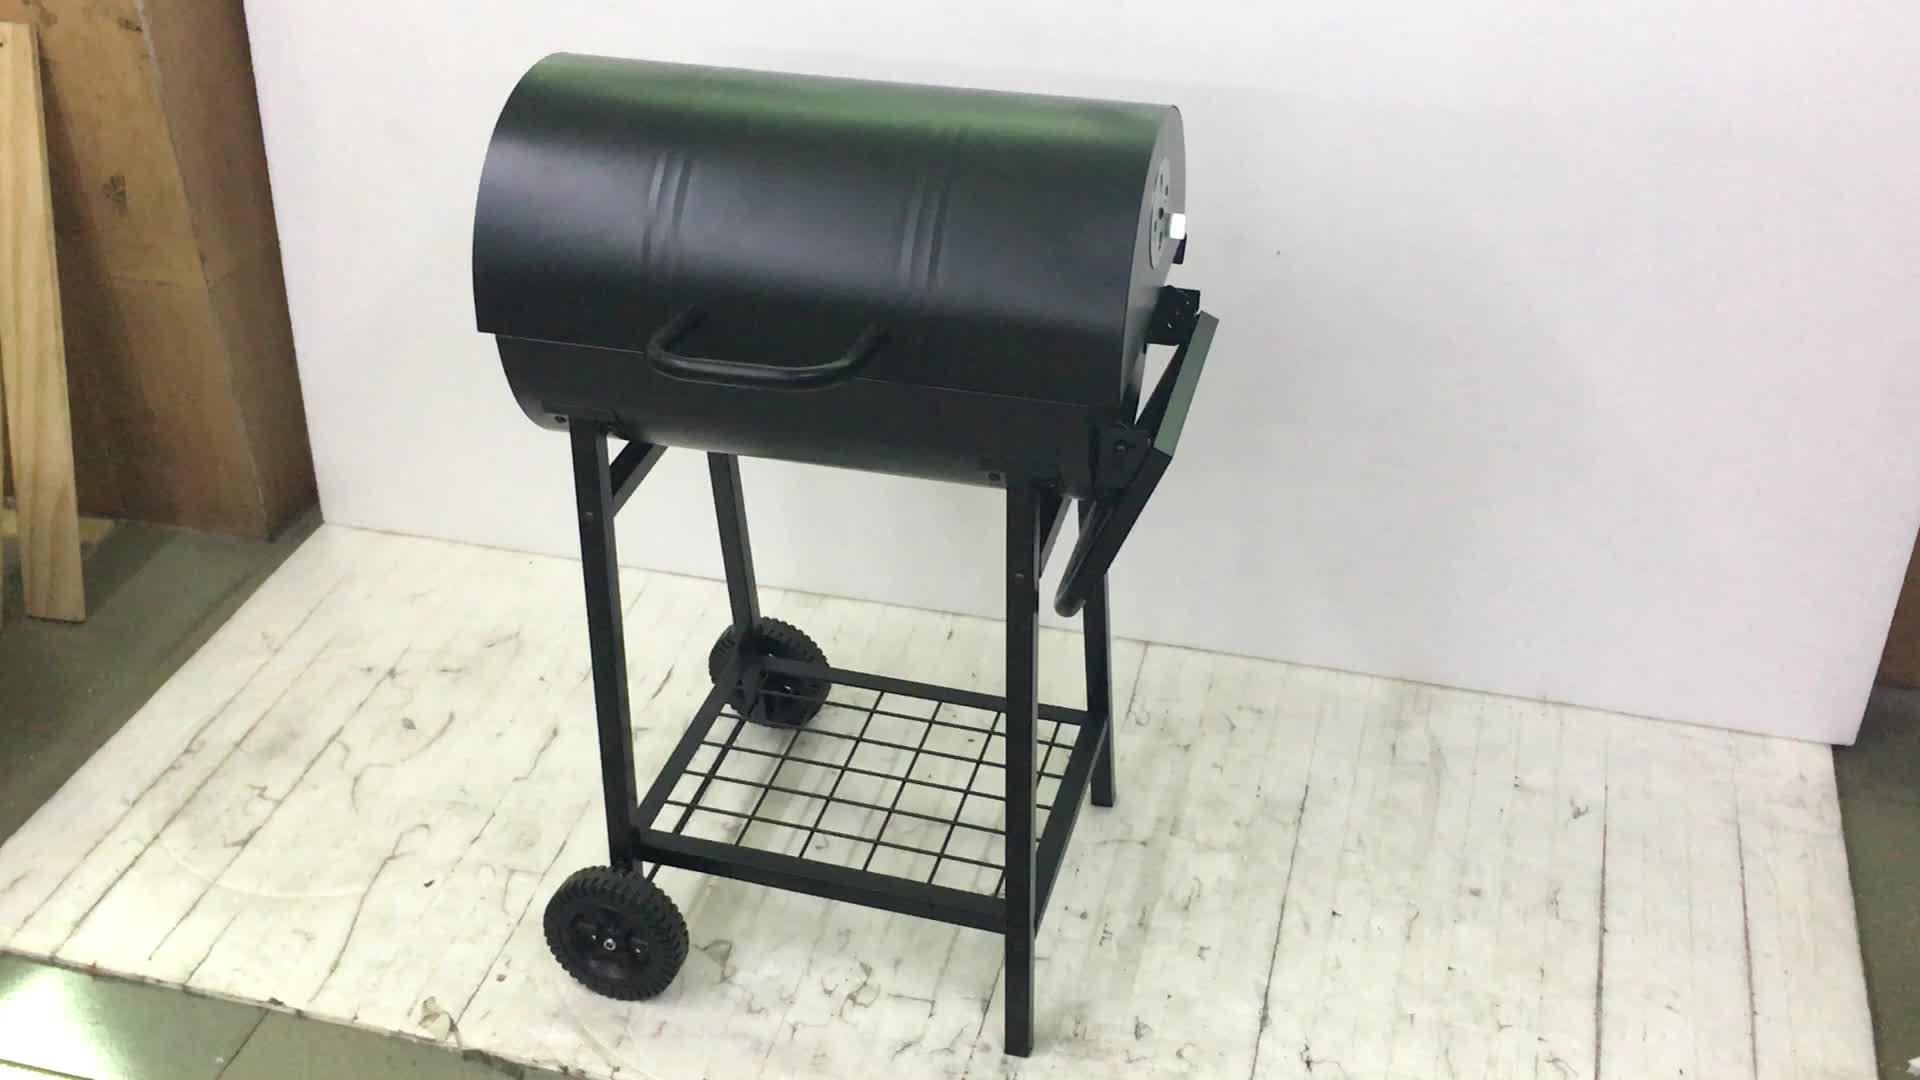 Budget ราคาไม่แพง backyard กลองขนาดใหญ่ aussie bbq pro ราคาถูก garden charcoal barrel ย่างเตาอบและสูบบุหรี่ด้านข้างตาราง